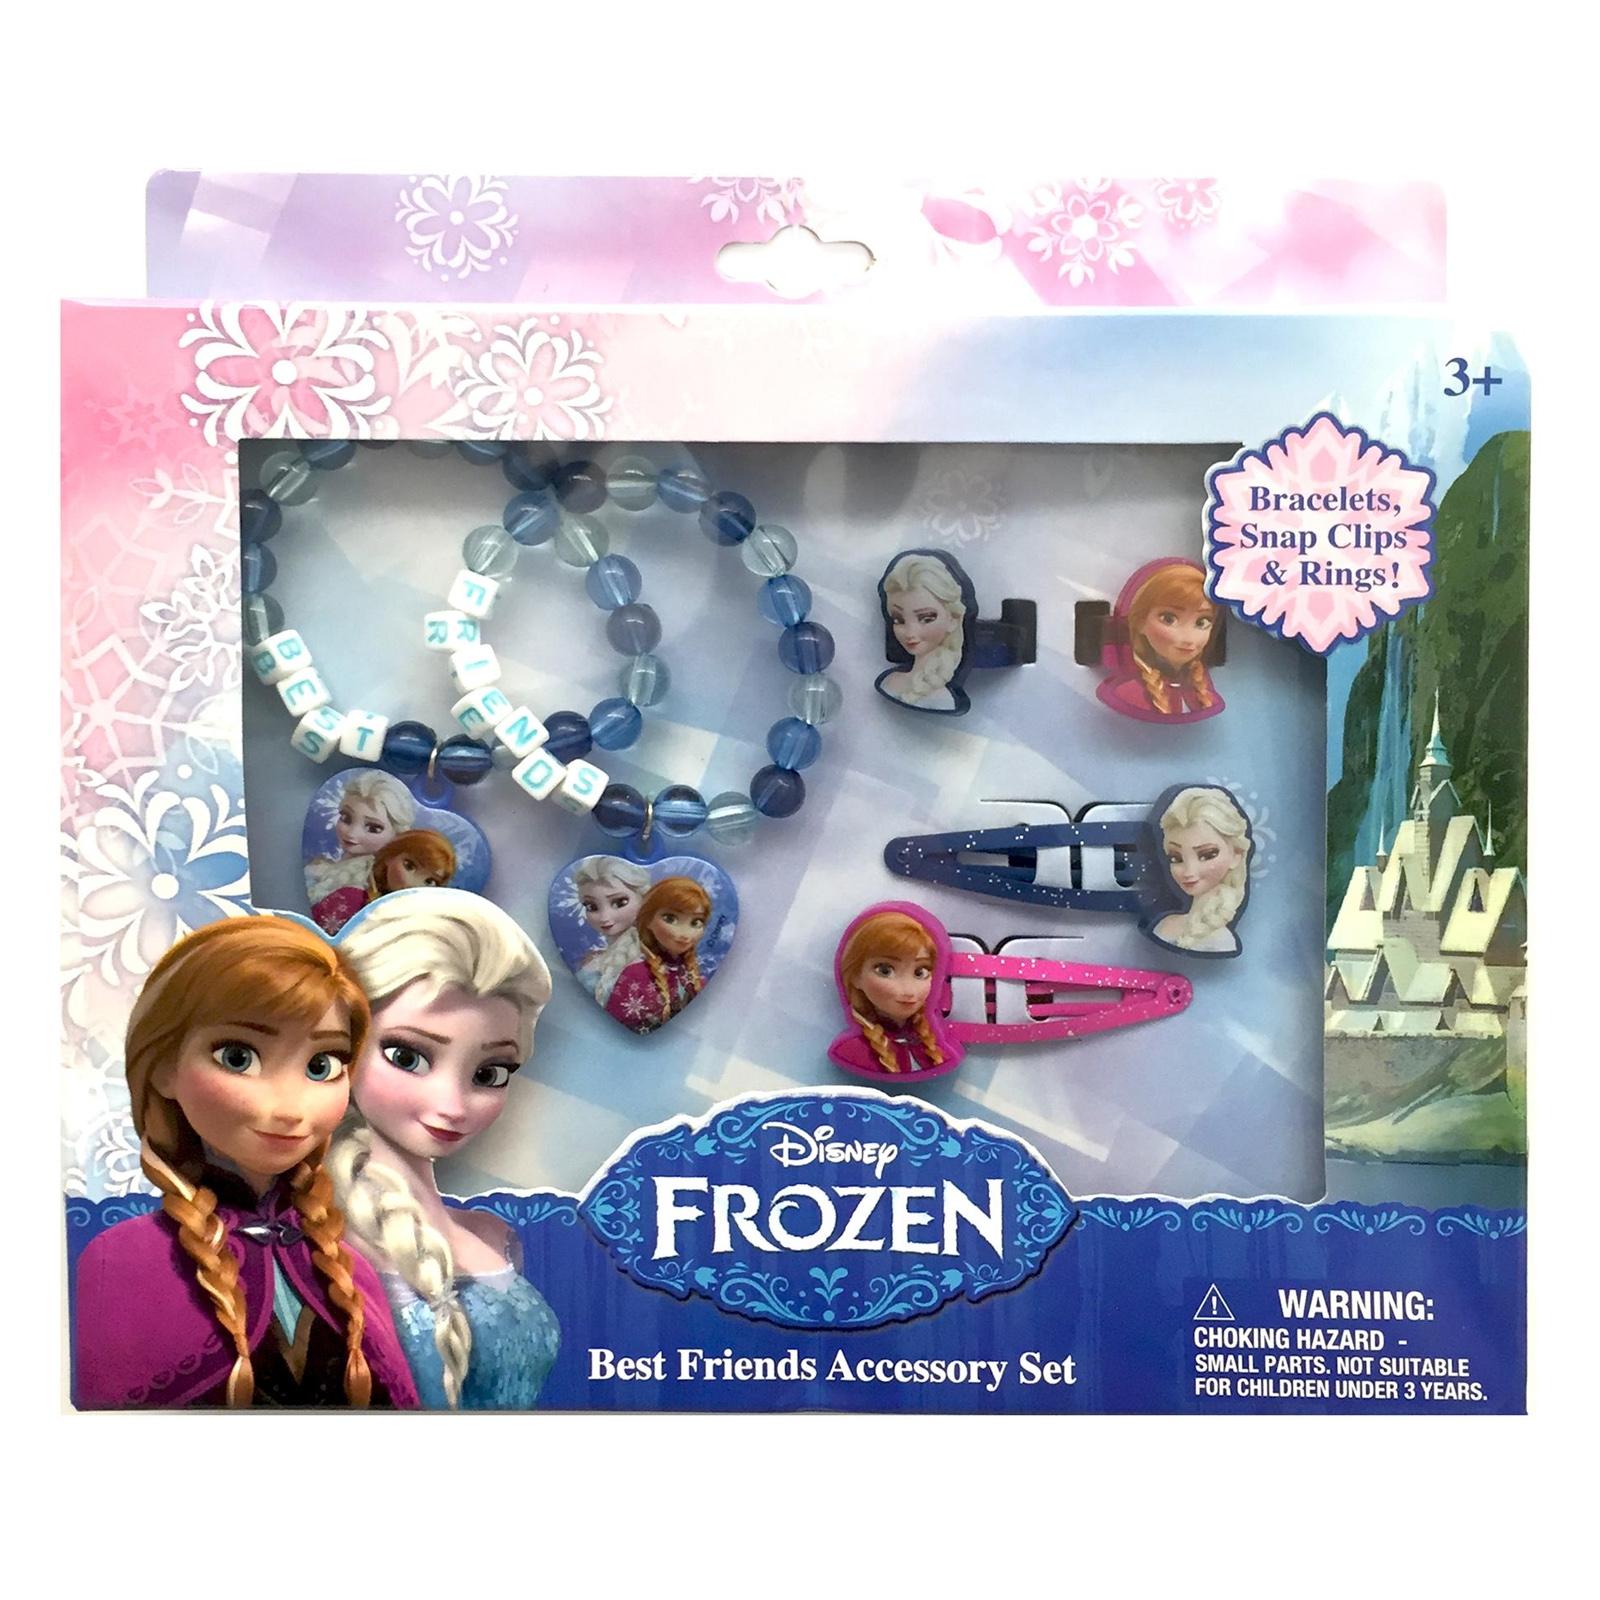 Disney Frozen Anna and Elsa Best Friends Set